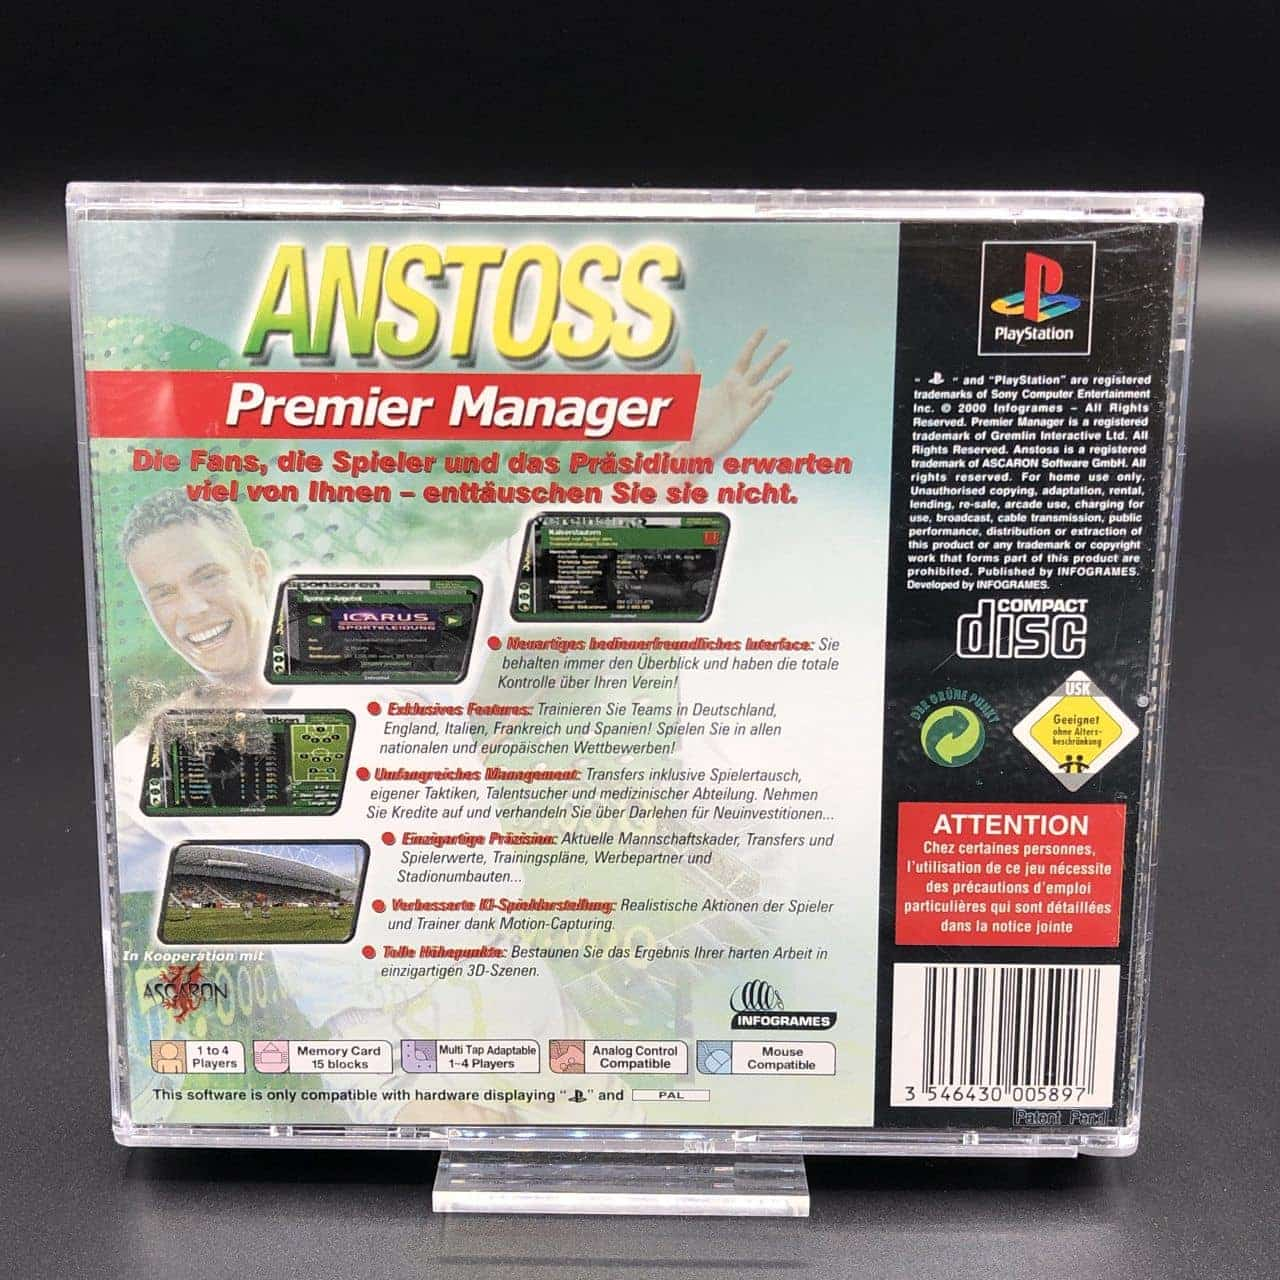 PS1 Anstoß Premier Manager (Komplett) (Sehr gut) Sony PlayStation 1